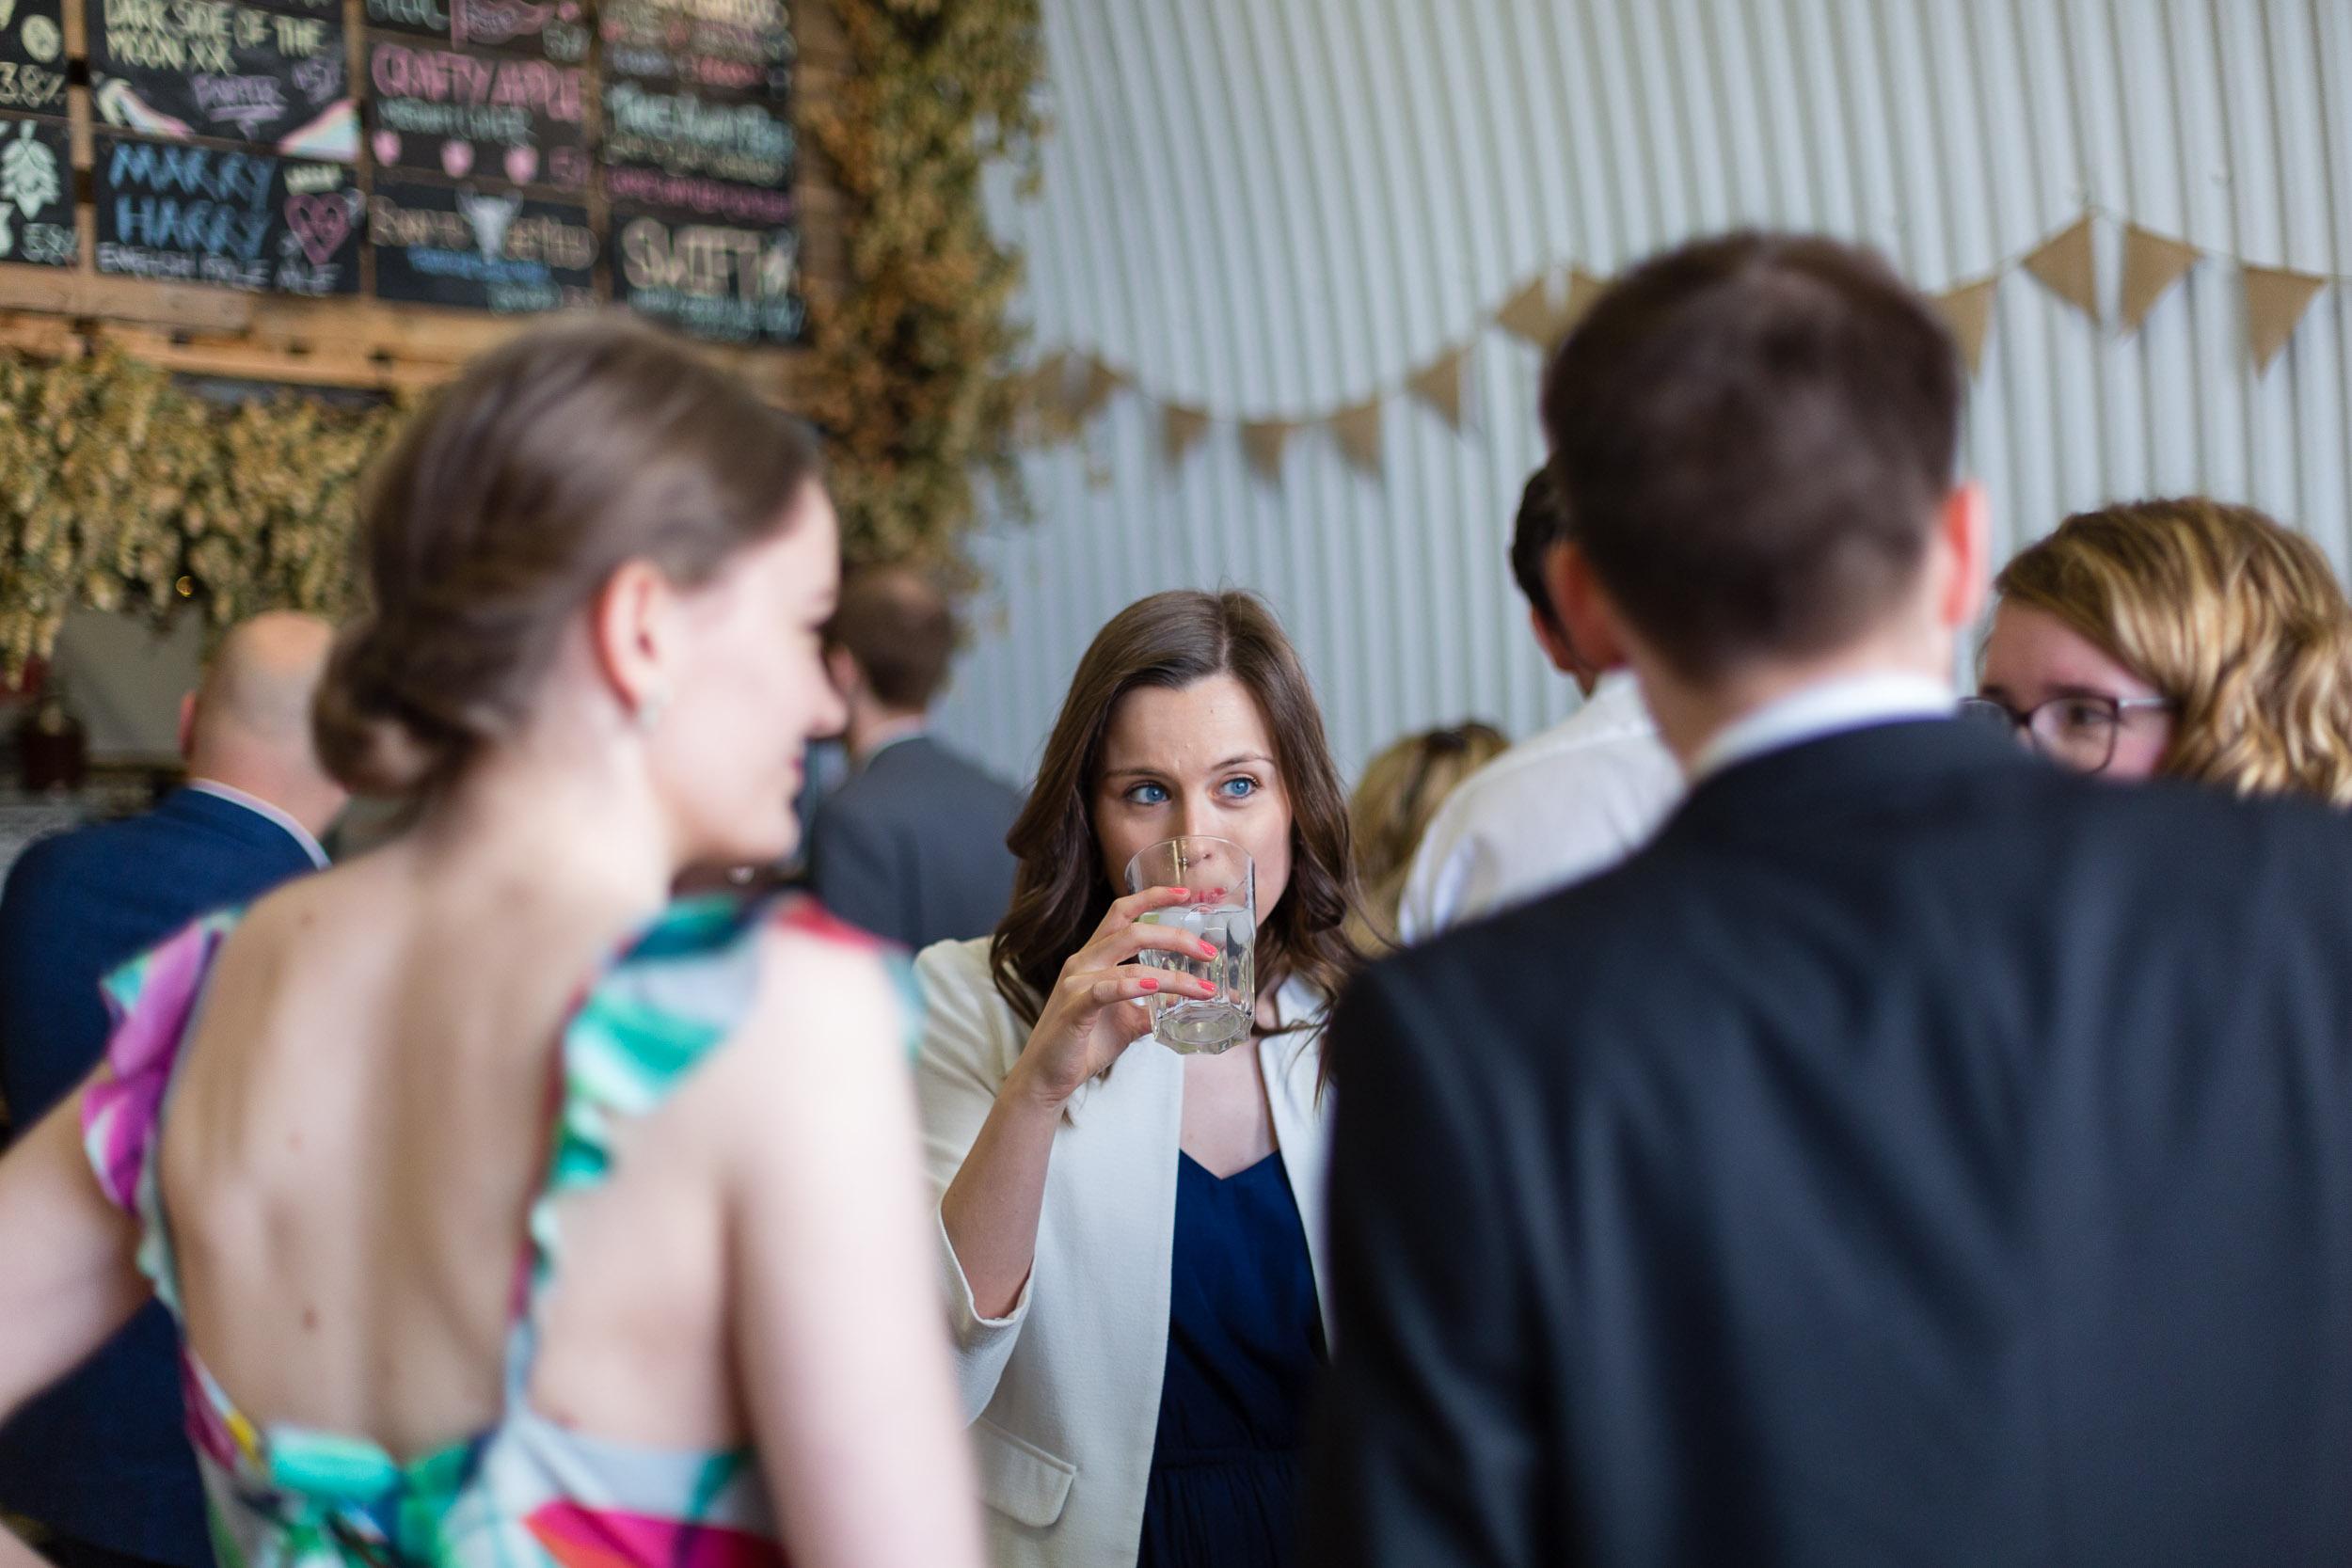 brockwell-lido-brixton-herne-hill-wedding-012.jpg